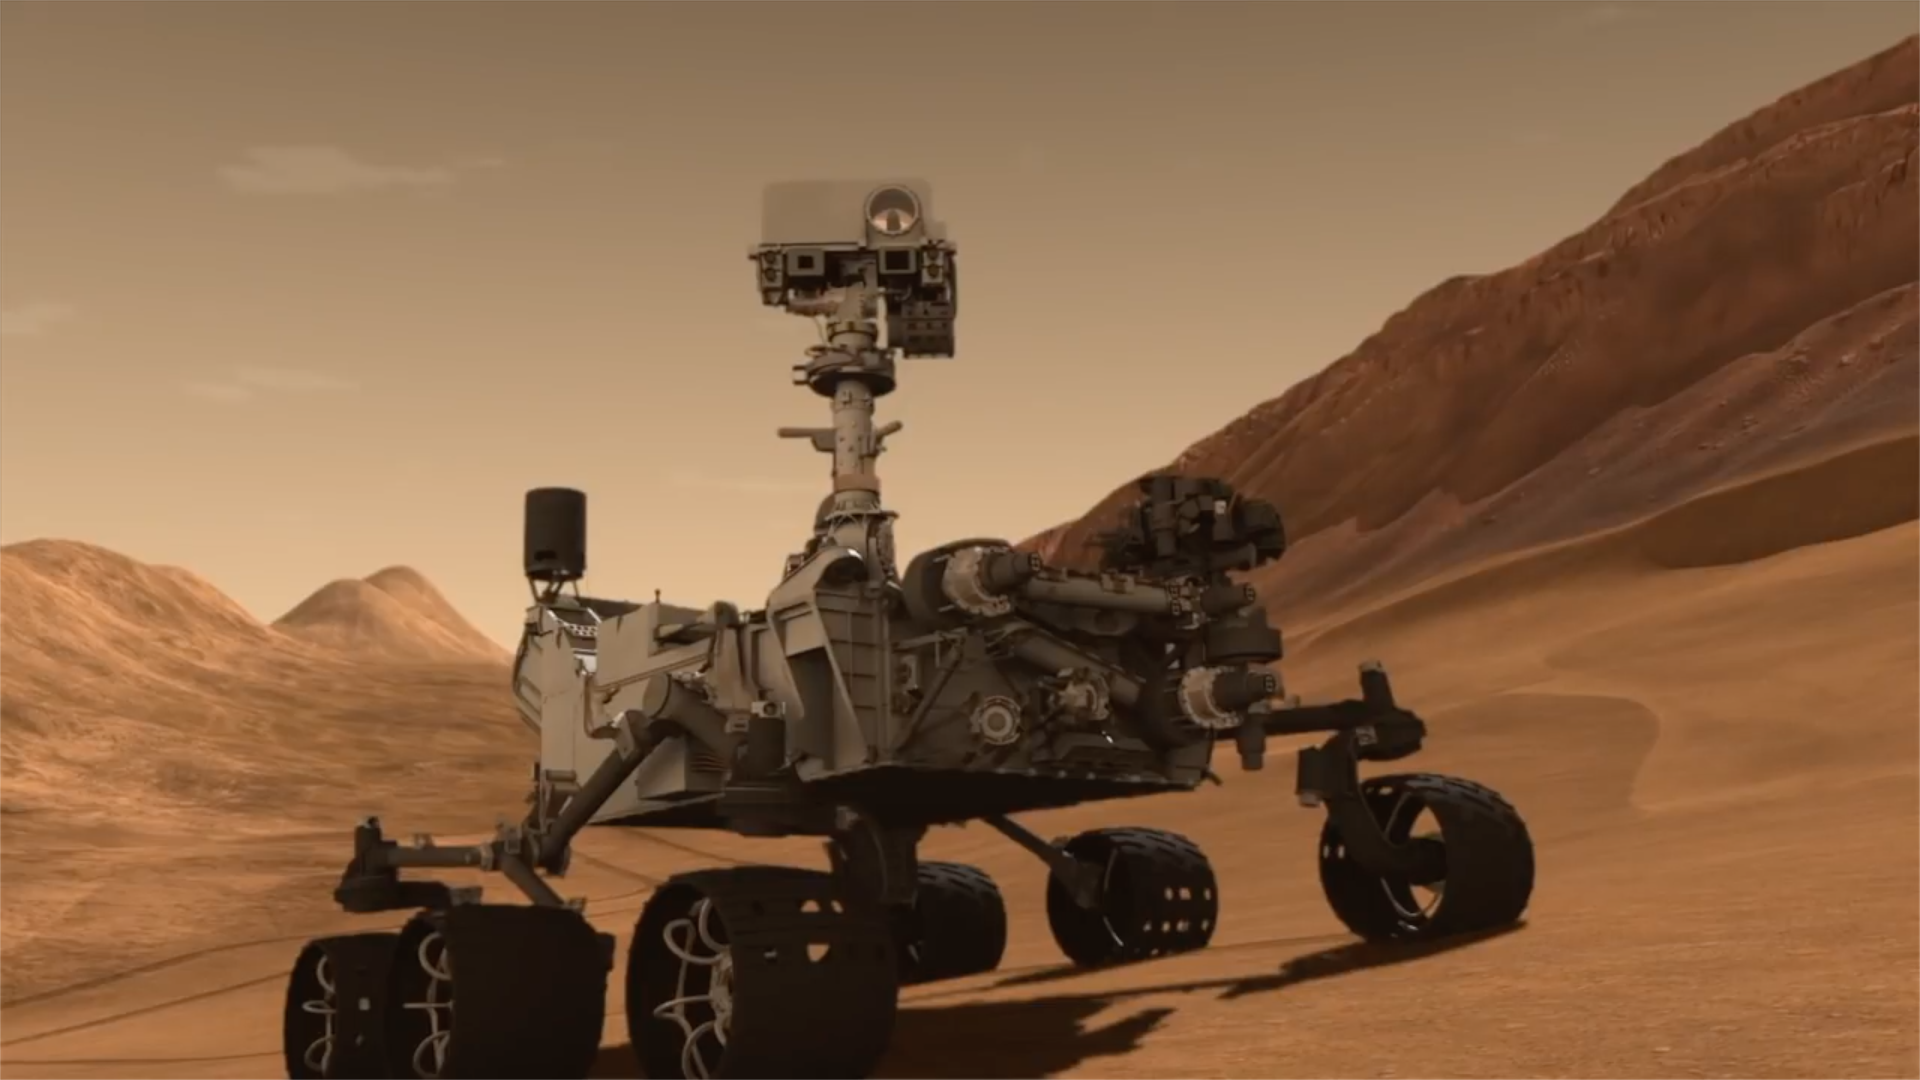 mars rover video - 1164×706